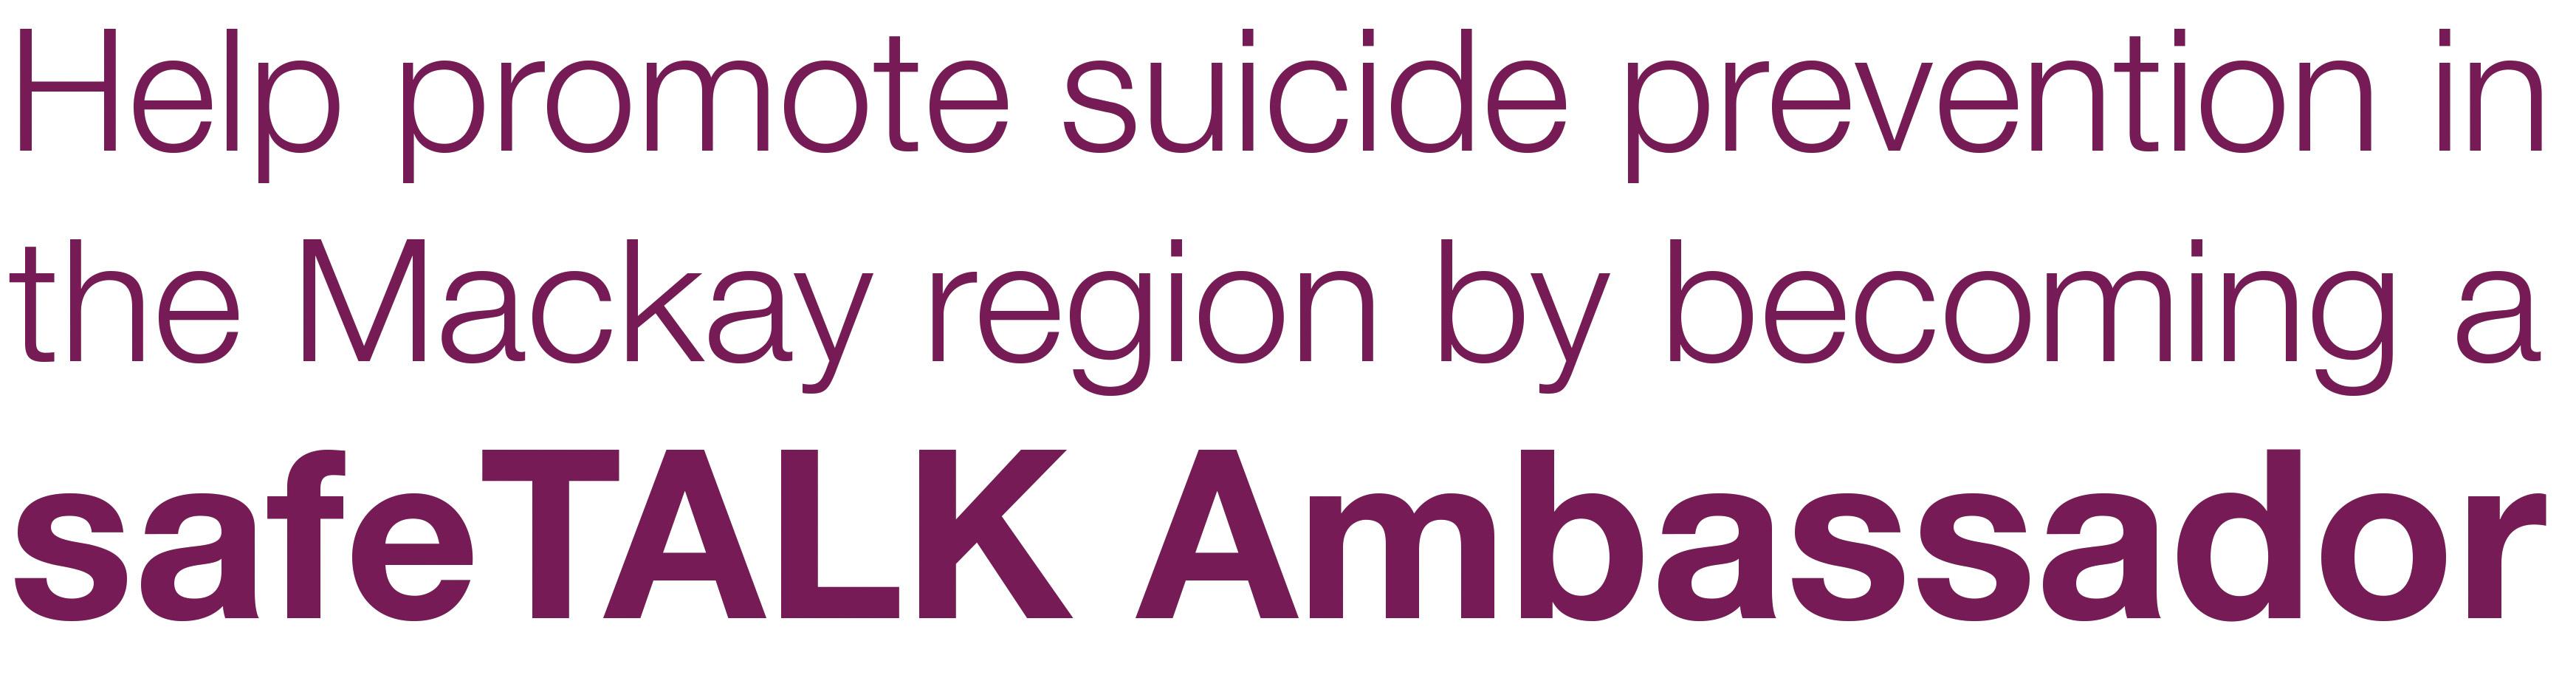 suicide prevention mackay